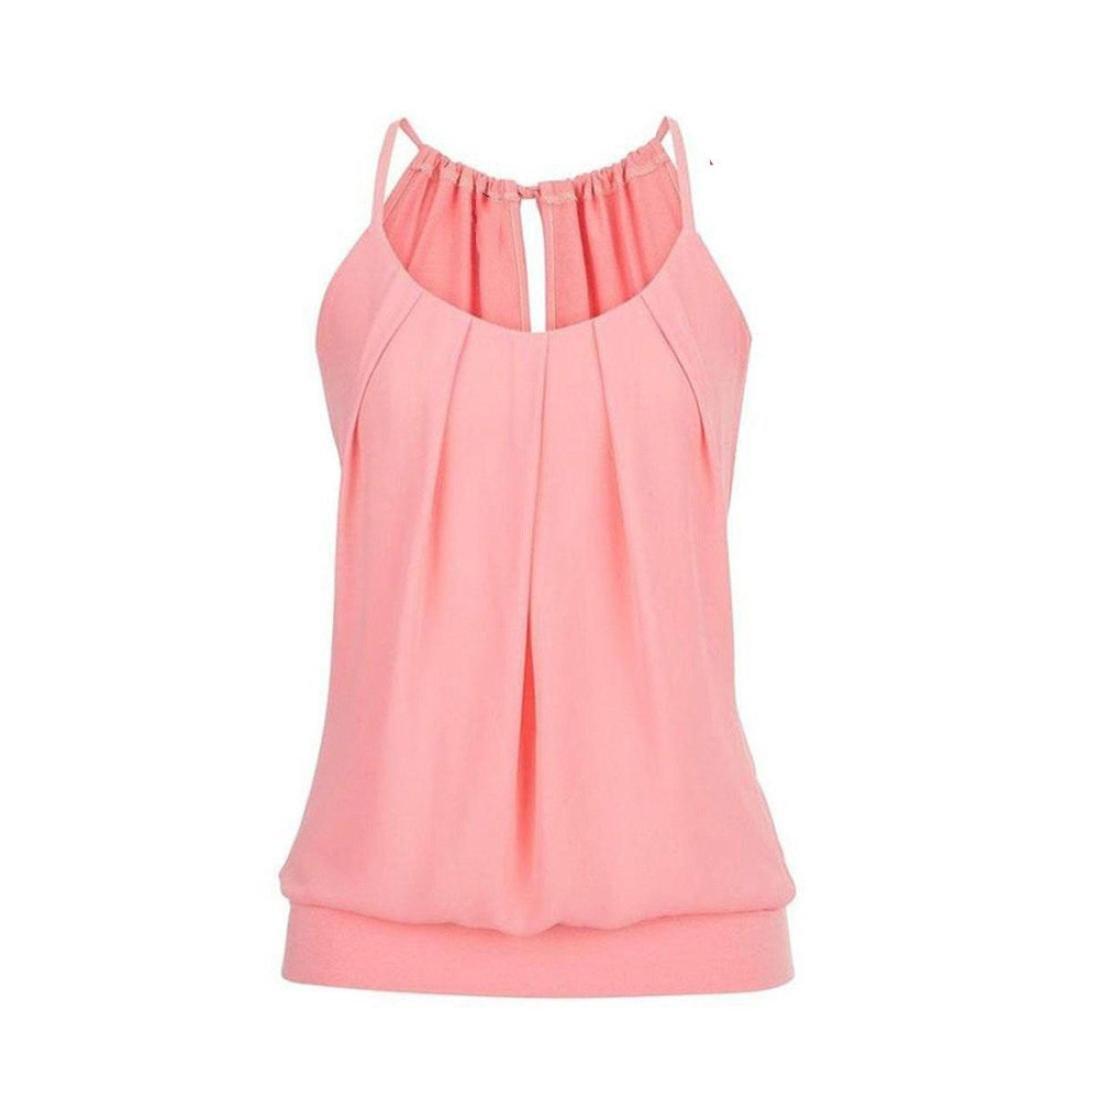 393eccc6ae74 ❤Polyester❤❤ women vests fashion women vests on sale women vests  lightweight women vest sweater women summer tops short sleeve women summer  shirts ...